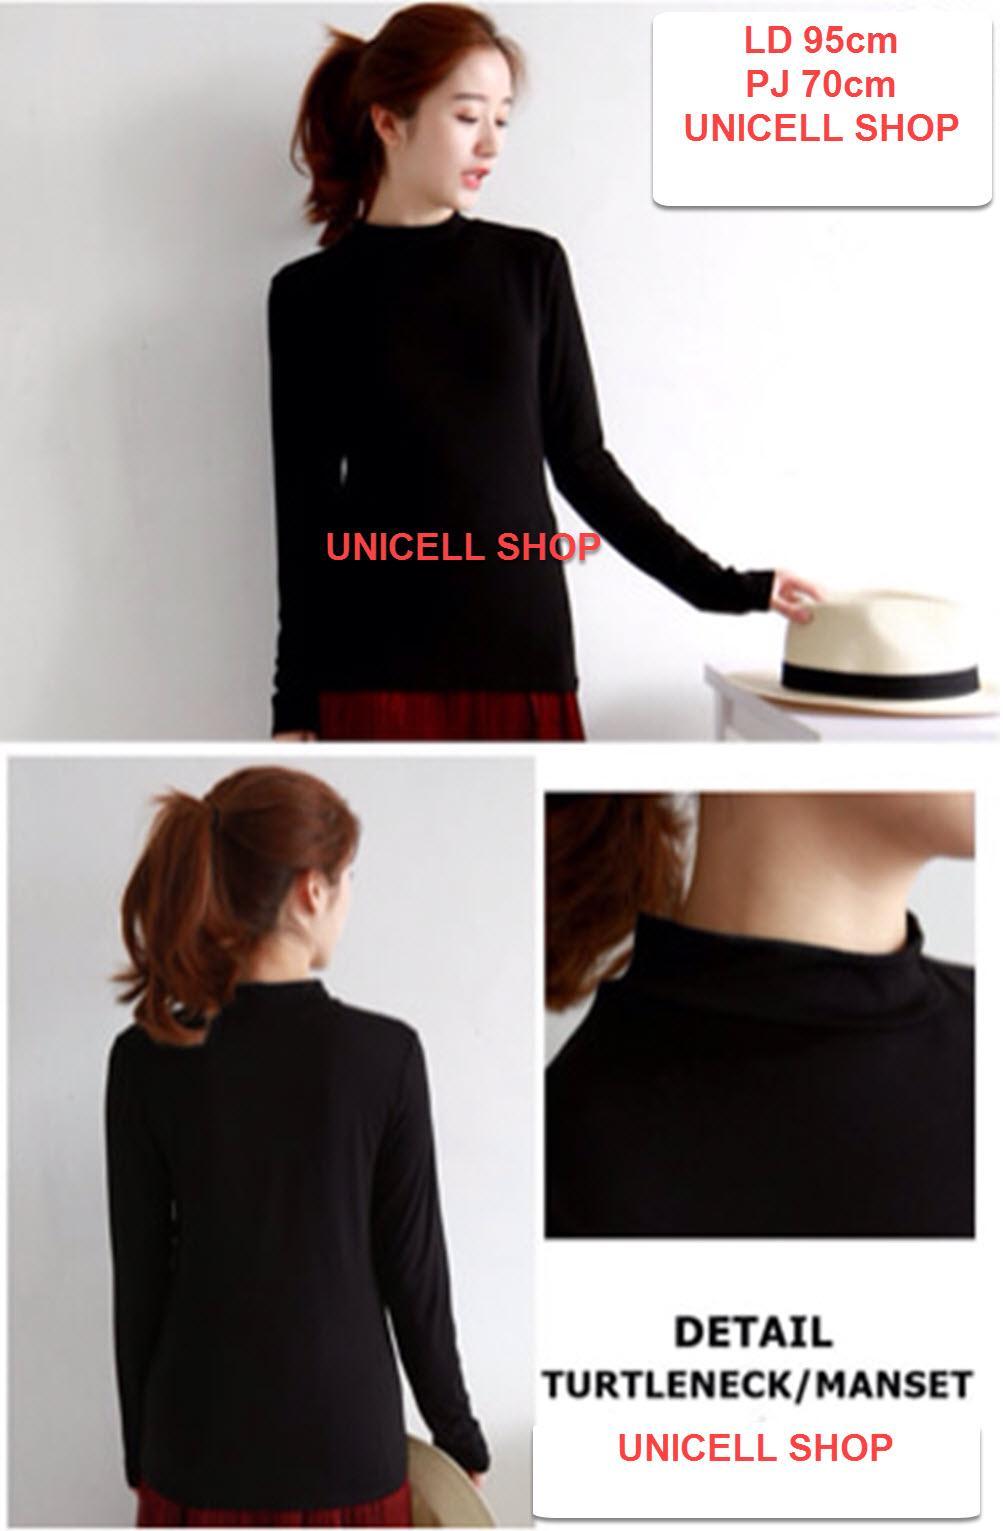 UC Baju Dalaman Maset Polos Kaos Wanita High Neck Lengan Panjang / Baju Wanita / Blouse Korea / Atasan Wanita / Kemeja Wanita / Kemeja Formal / Atasan Muslim / Manset Dalaman Cewek Tunik / Kaos Cewek / Turtle Neck / Baju Santai (Manset) XX - Hitam Putih